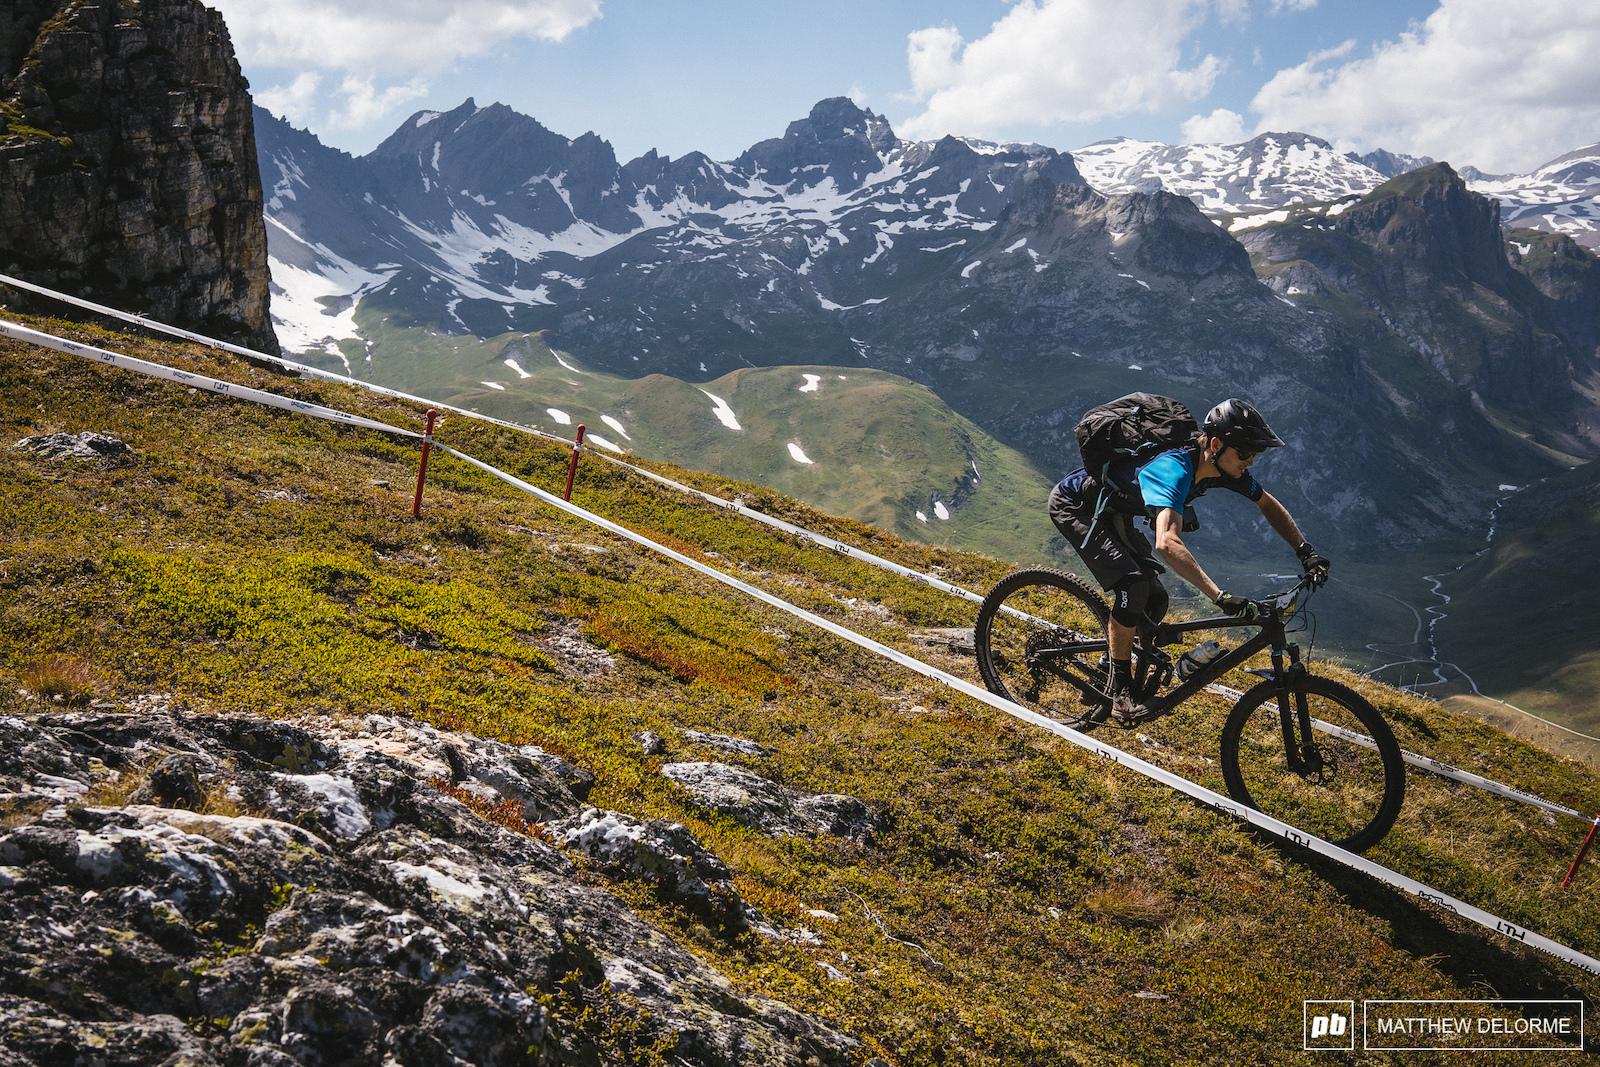 Duncan Philpott tucks into some proper alpine goodness.